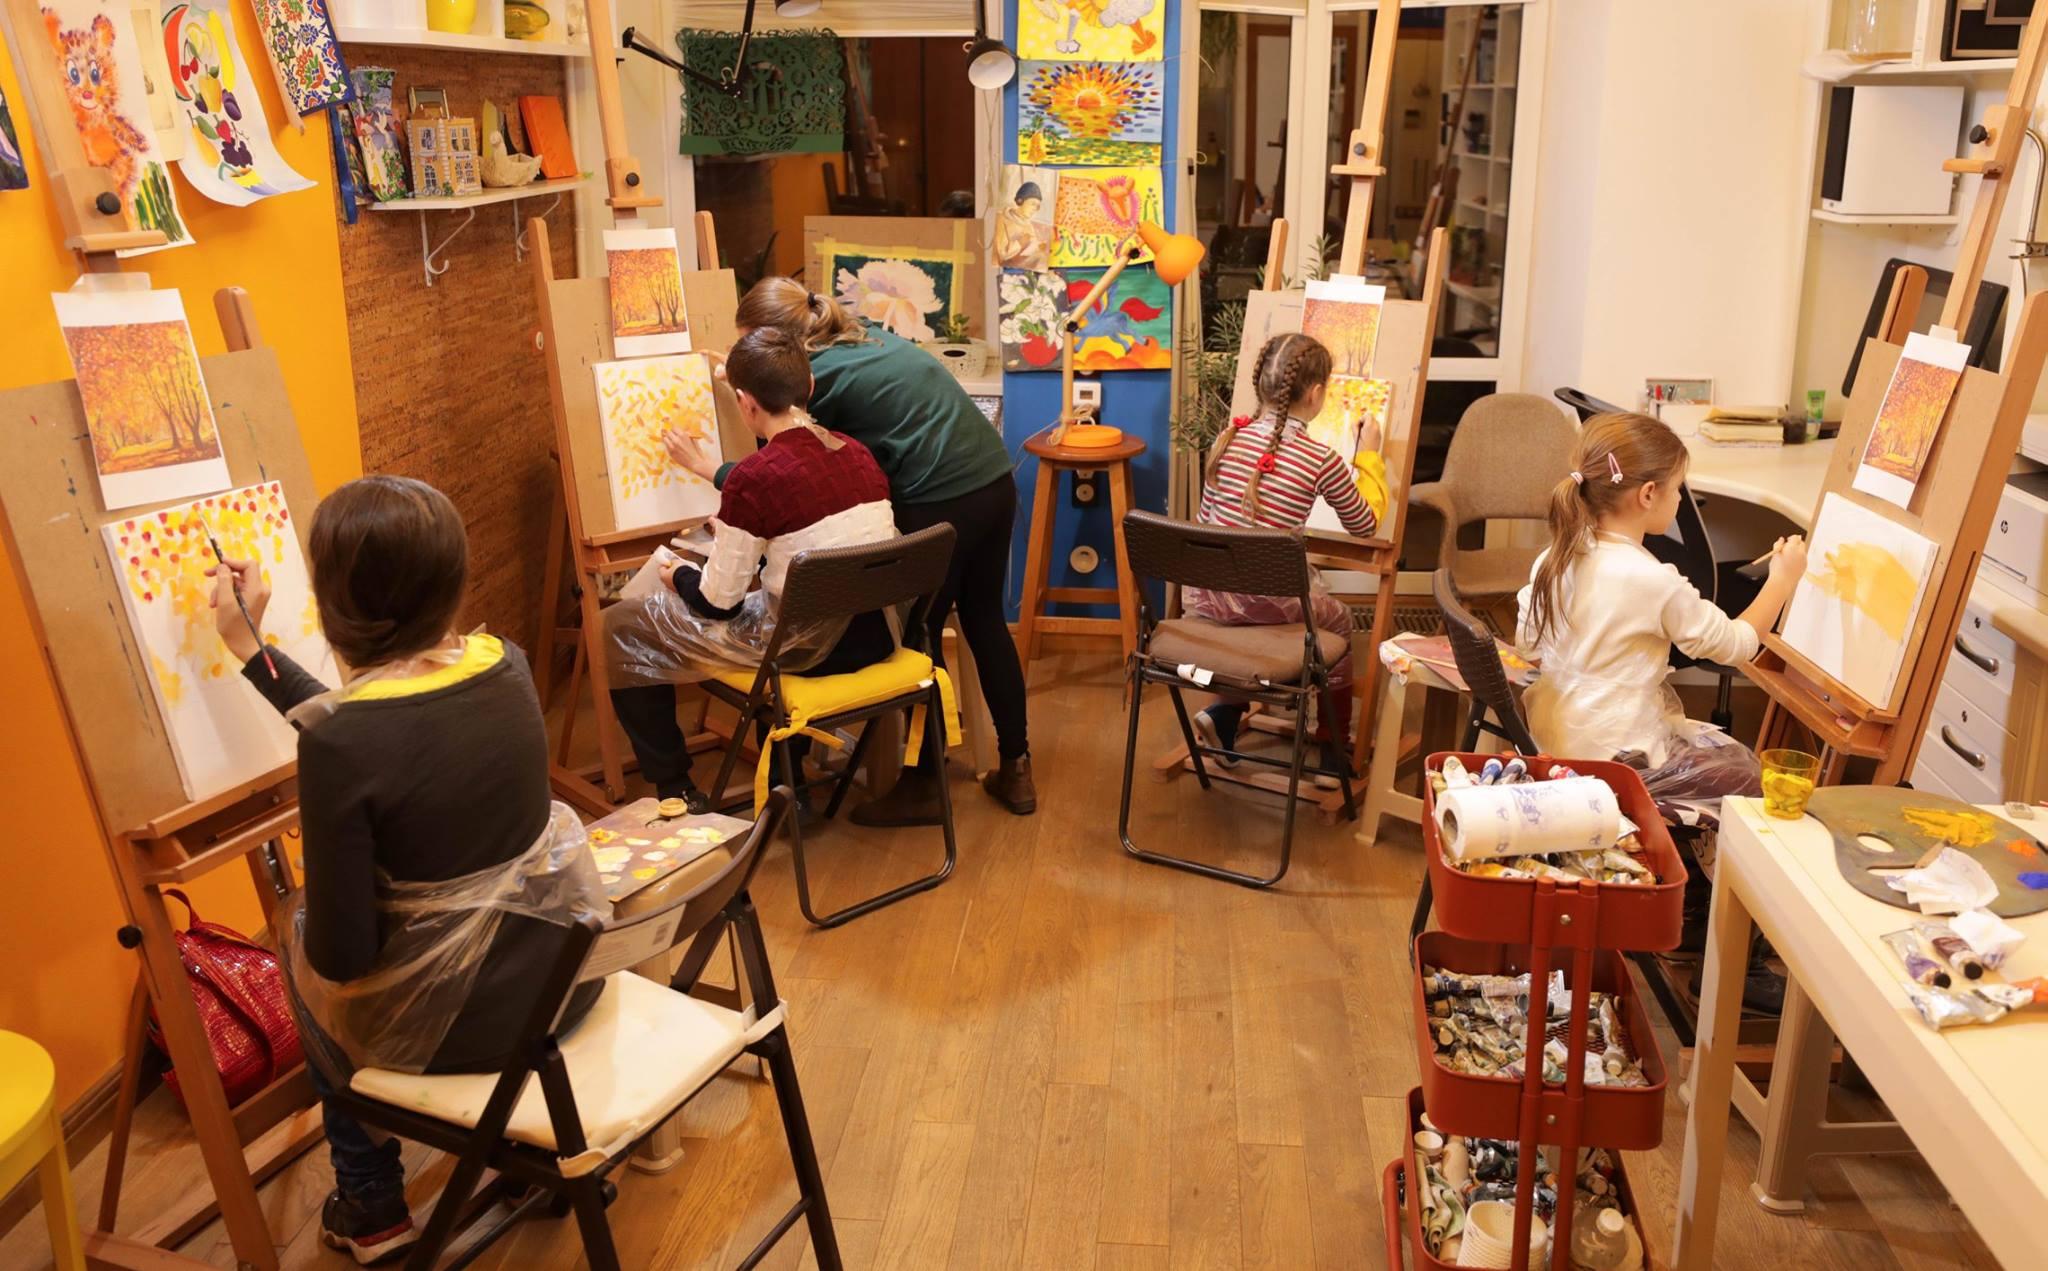 Мастер-класс по маслу для деток «Осенний натюрморт» - фото